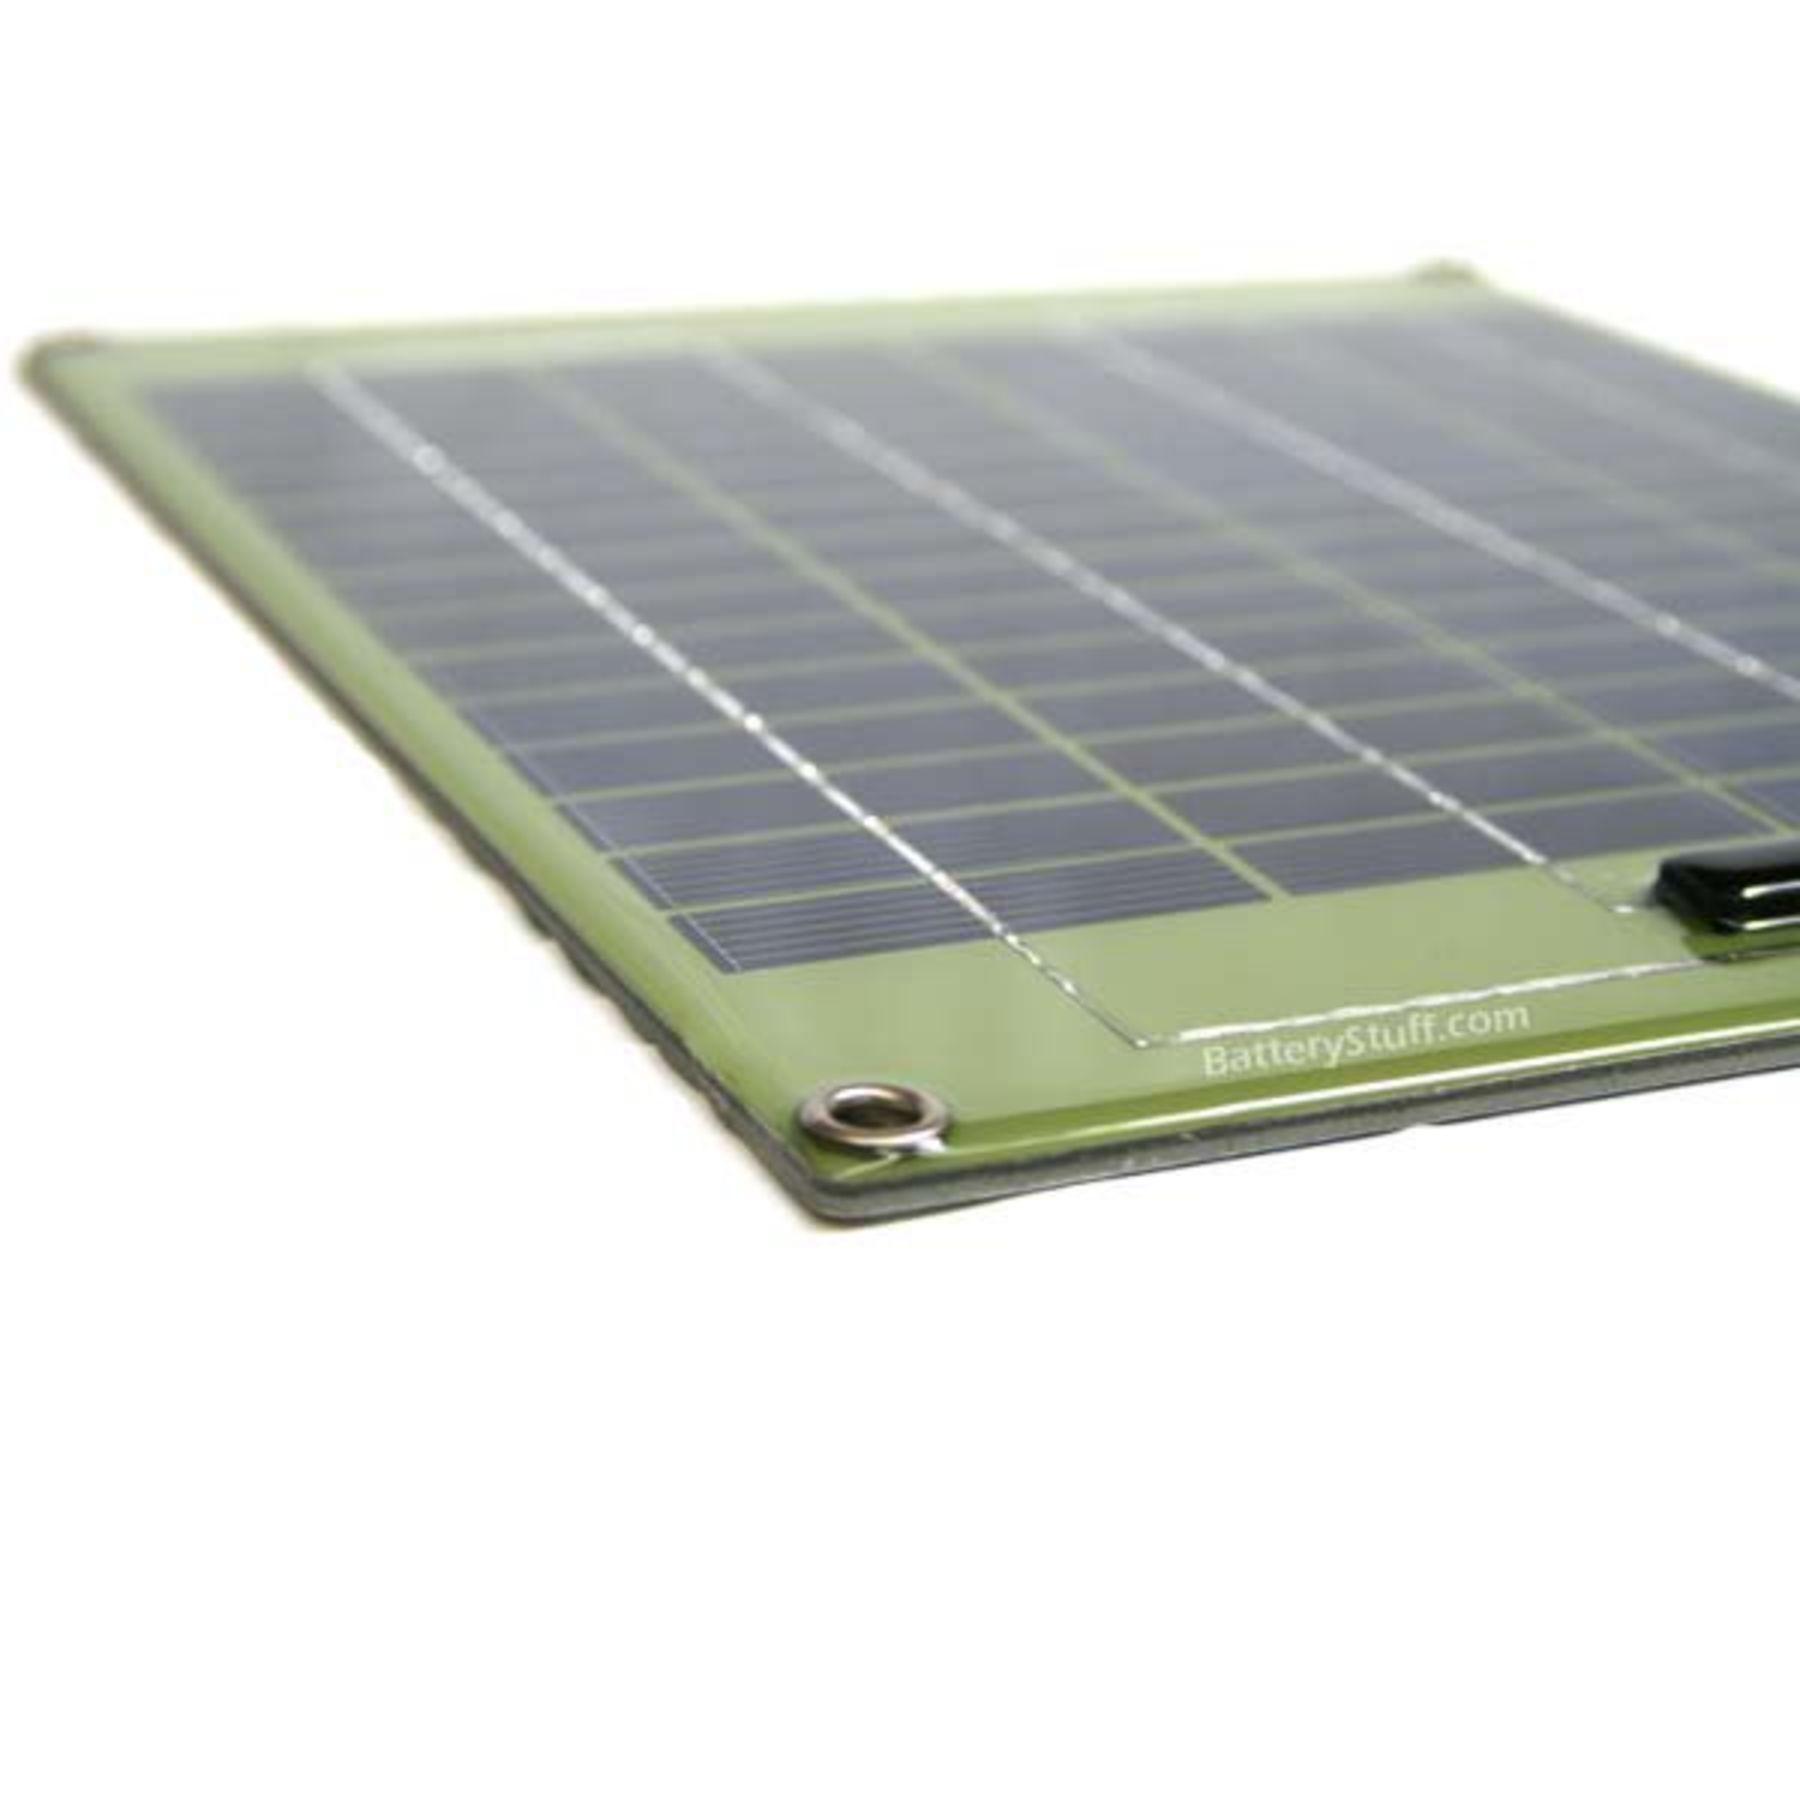 Pulse Tech 24v Desulfating Solar Panel 735x333 Sp 24psc